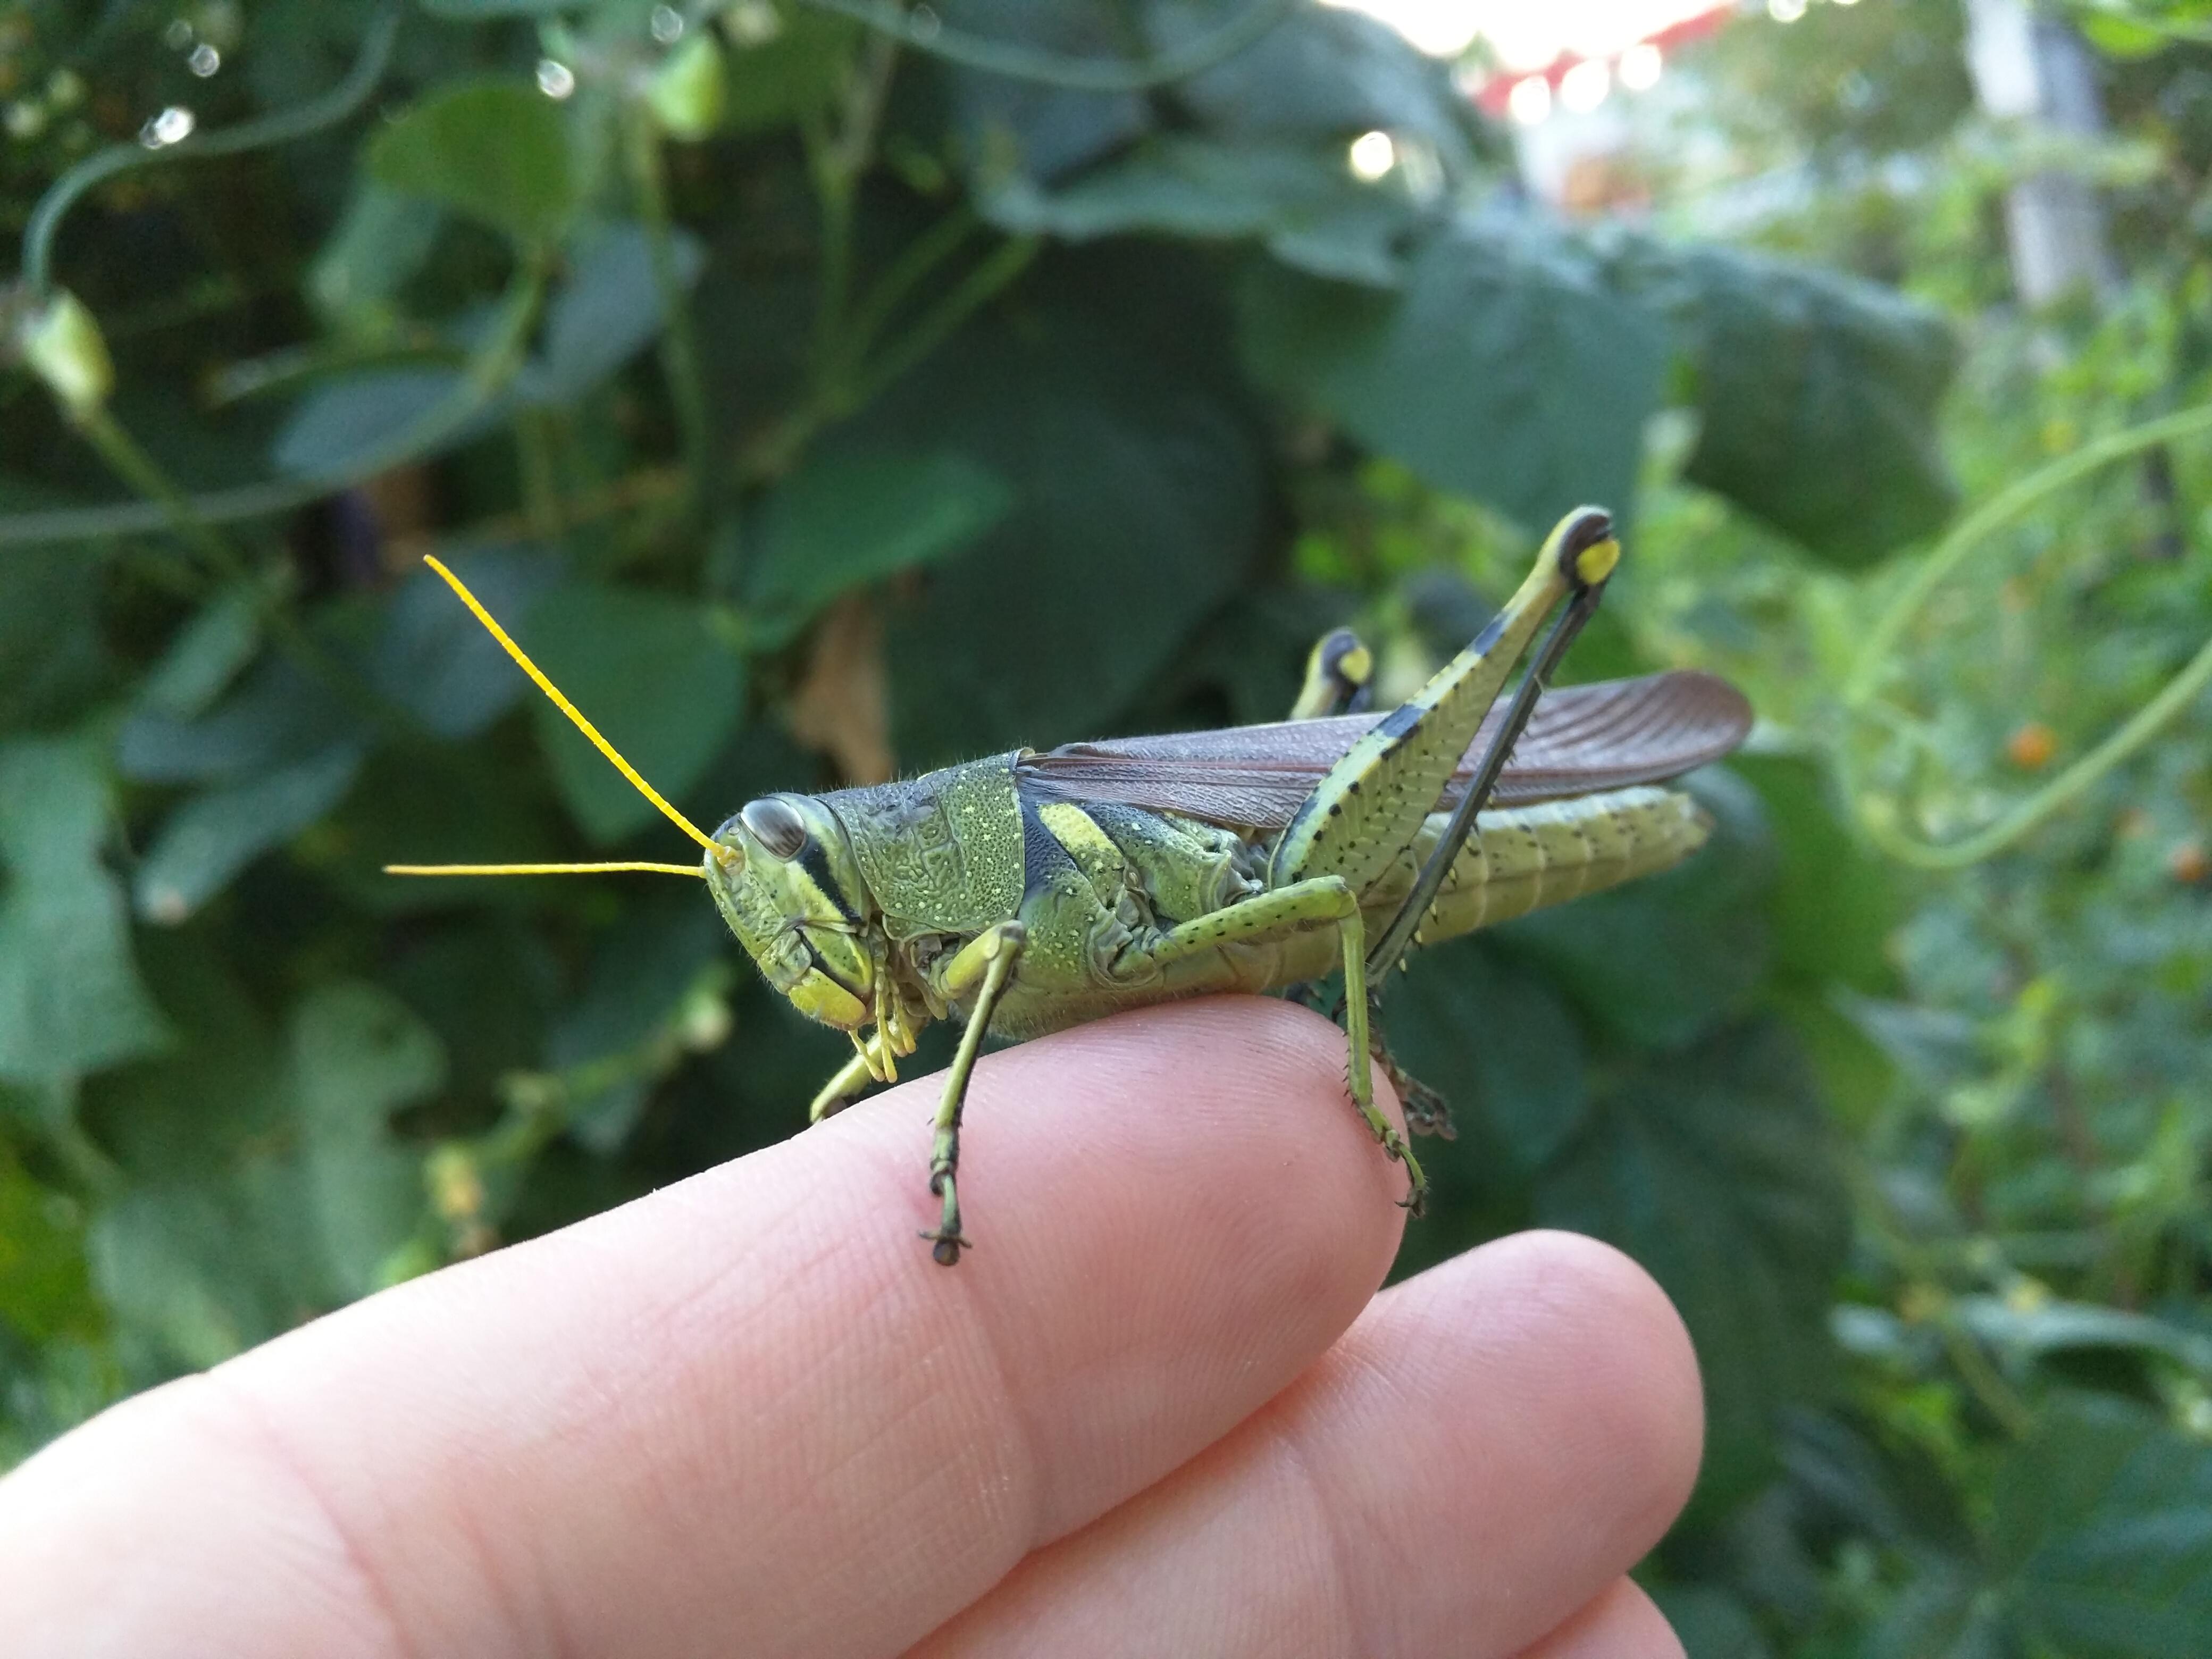 Rusty Bird Grasshopper (Schistocerca alutacea)